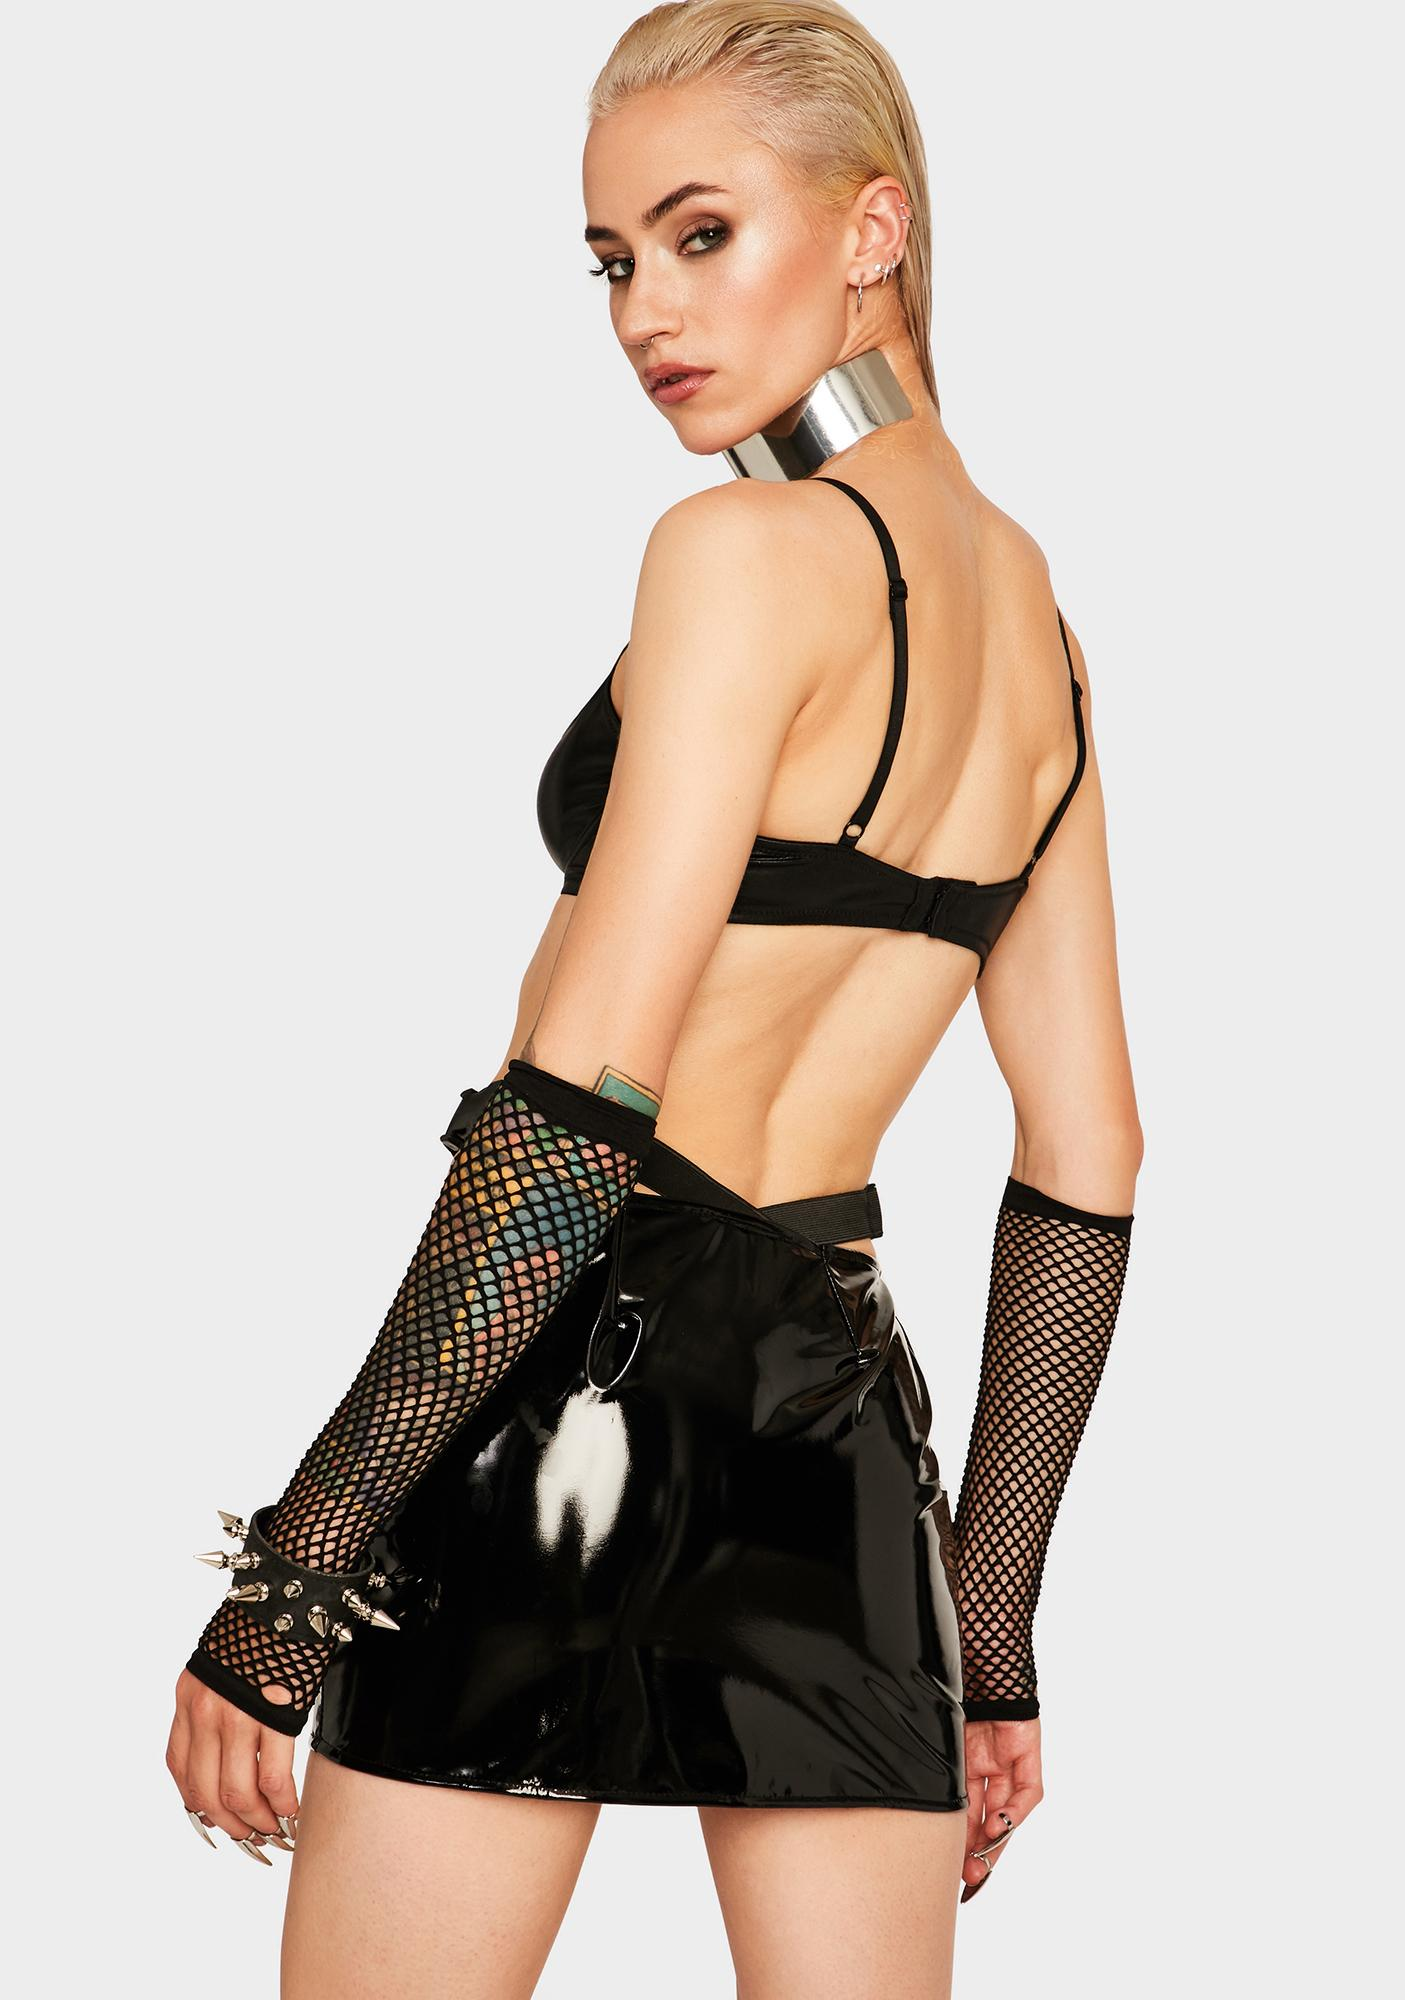 Tiar PVC Thong Mini Skirt